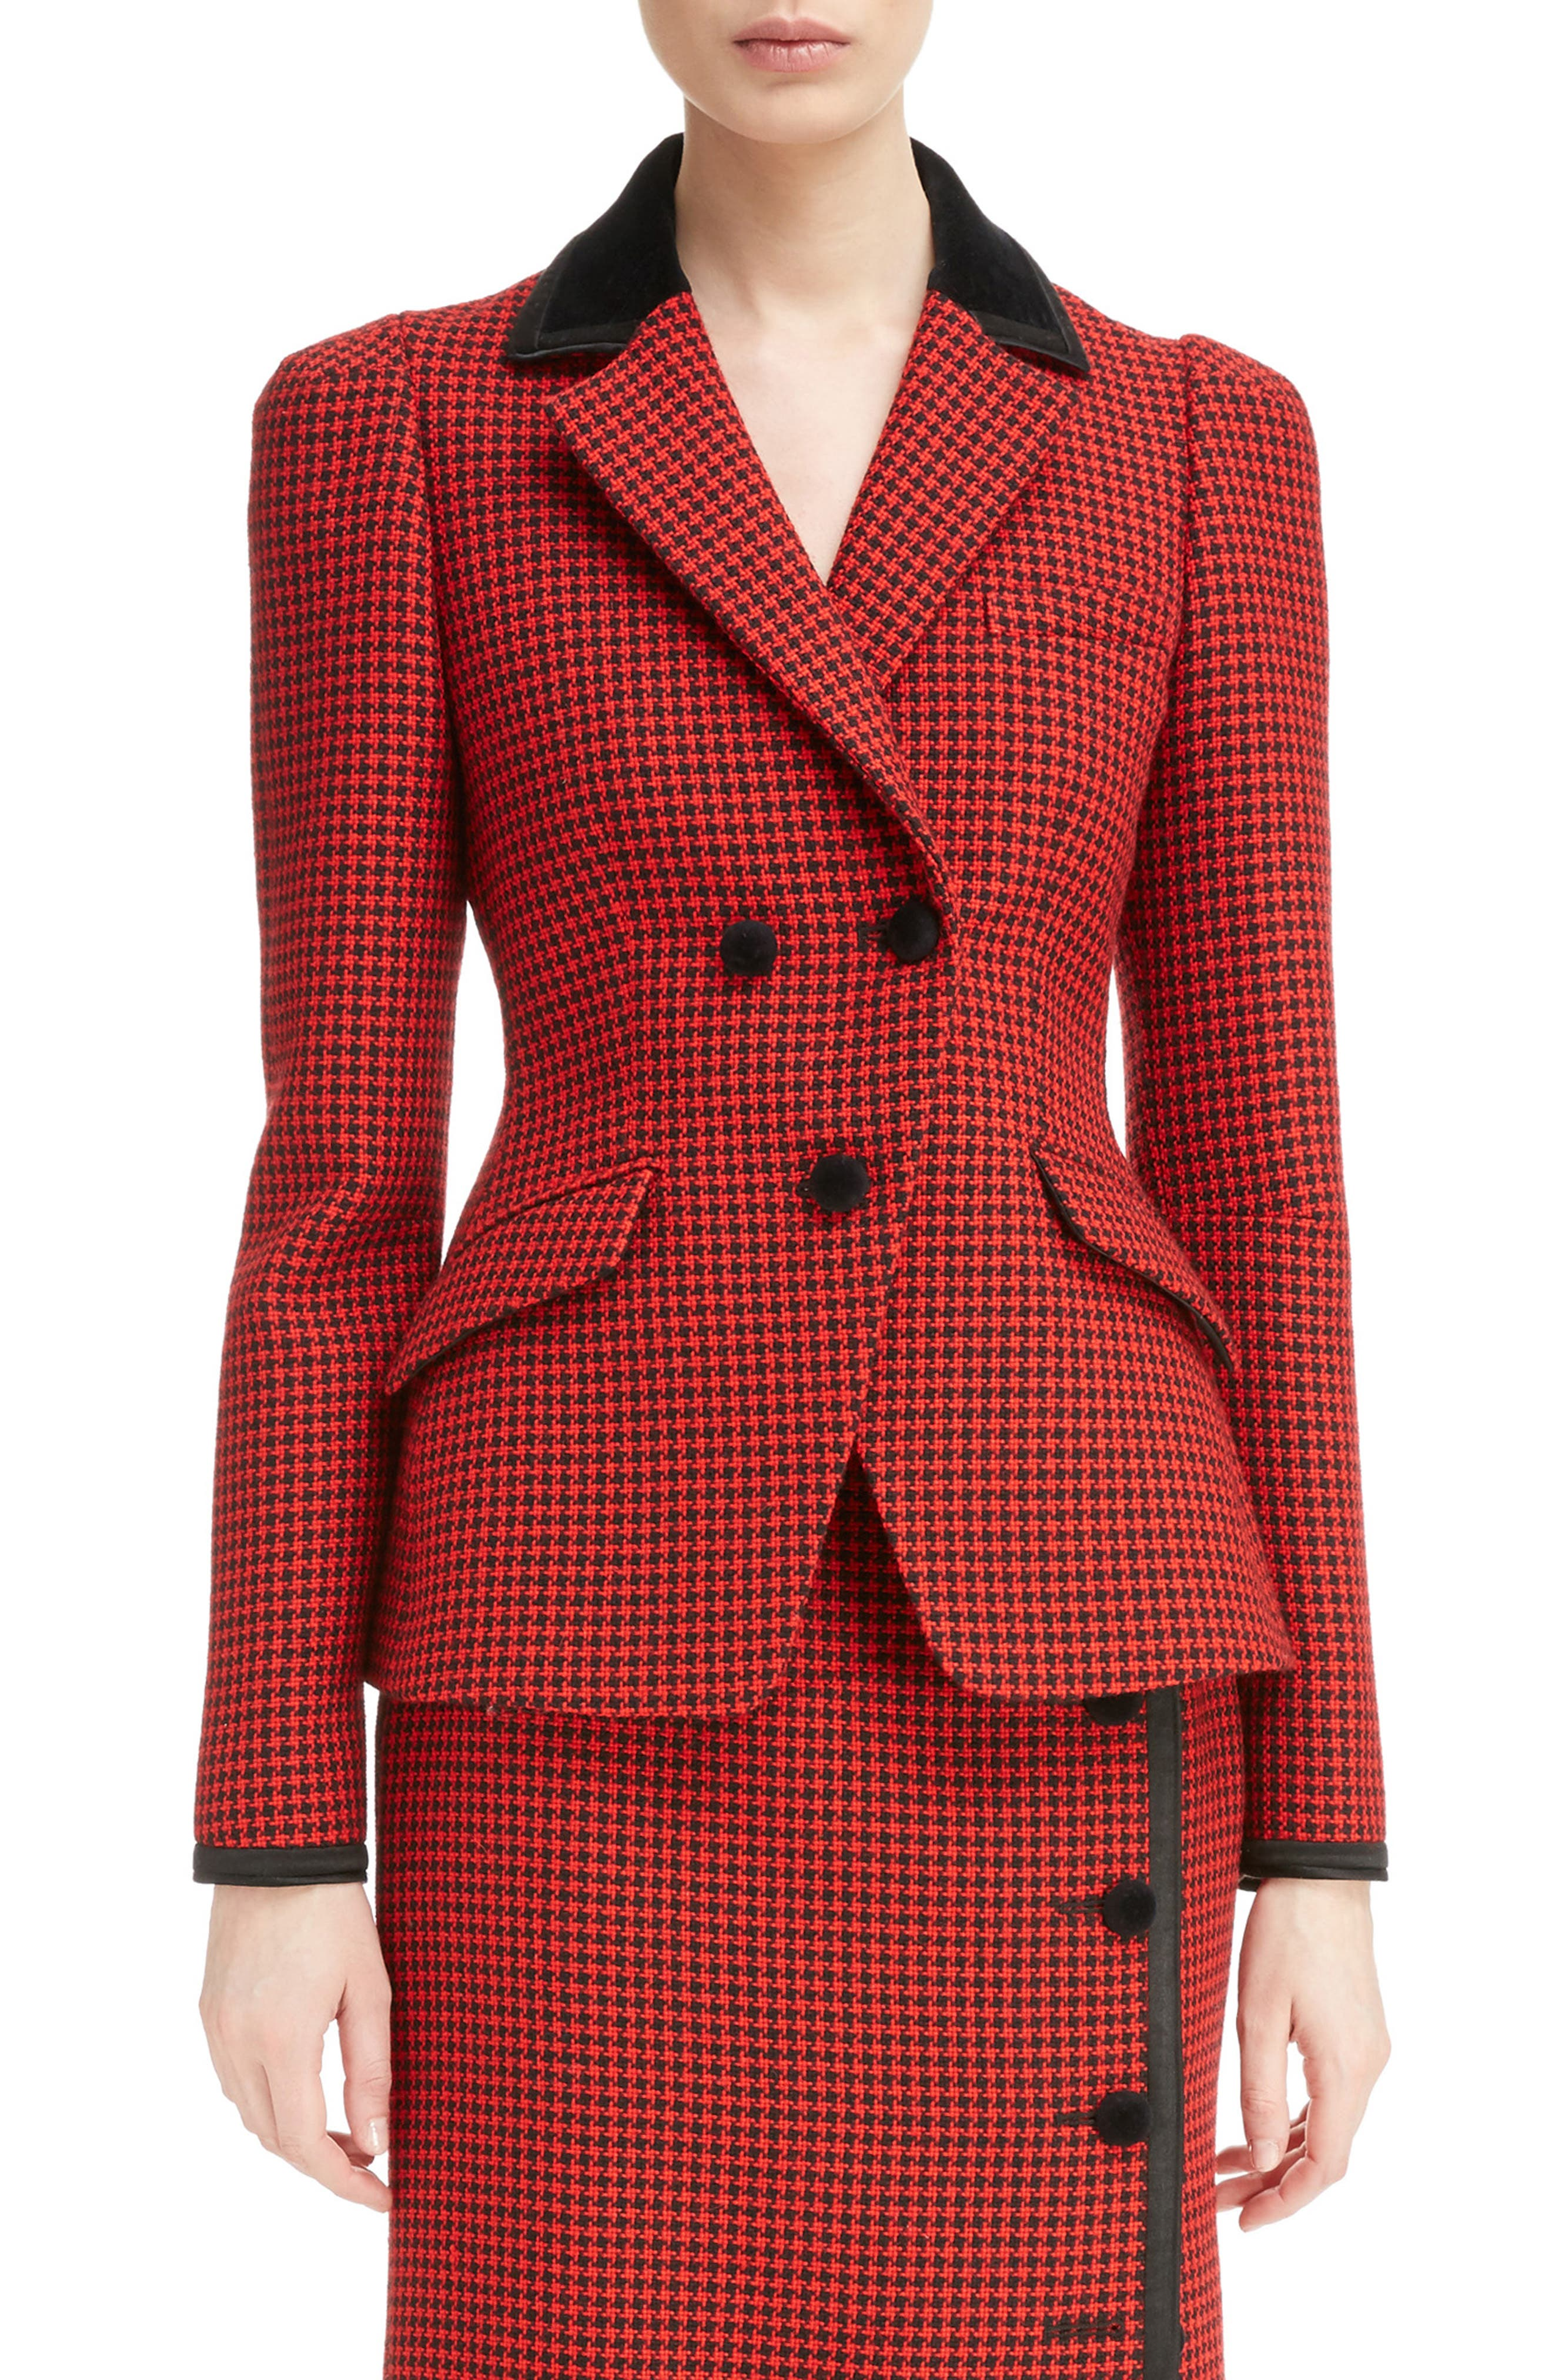 Paladini Houndstooth Wool Jacket,                         Main,                         color,